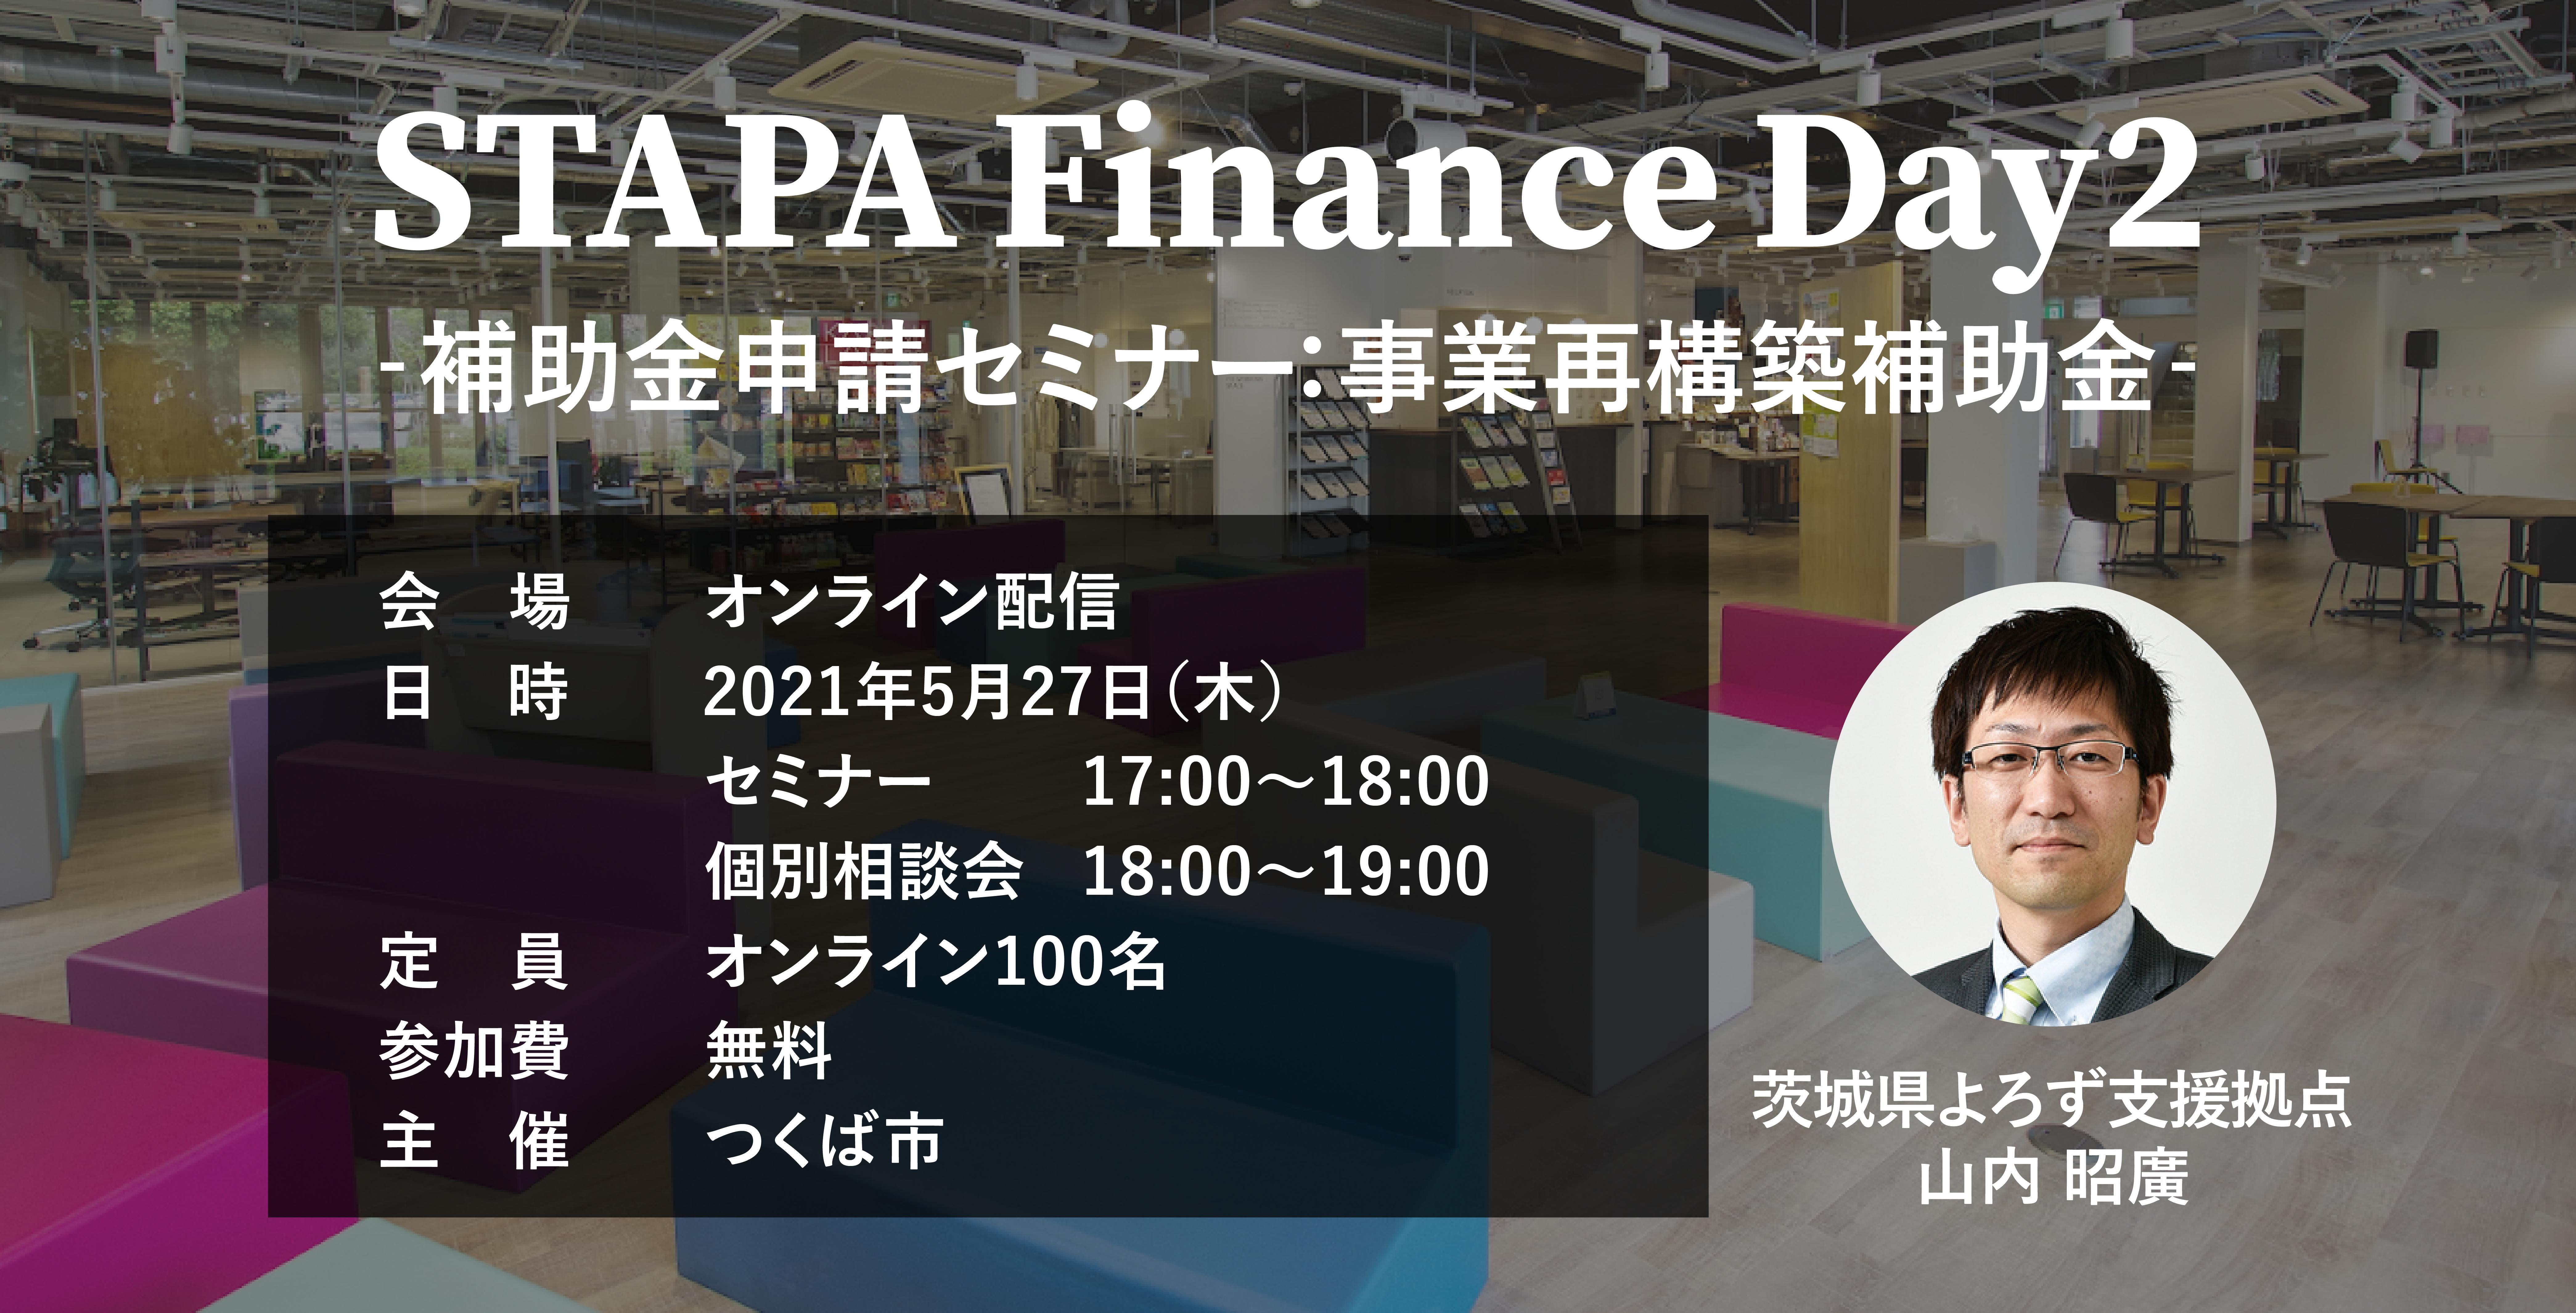 STAPA Finance Day2 -補助金申請セミナー:事業再構築補助金-